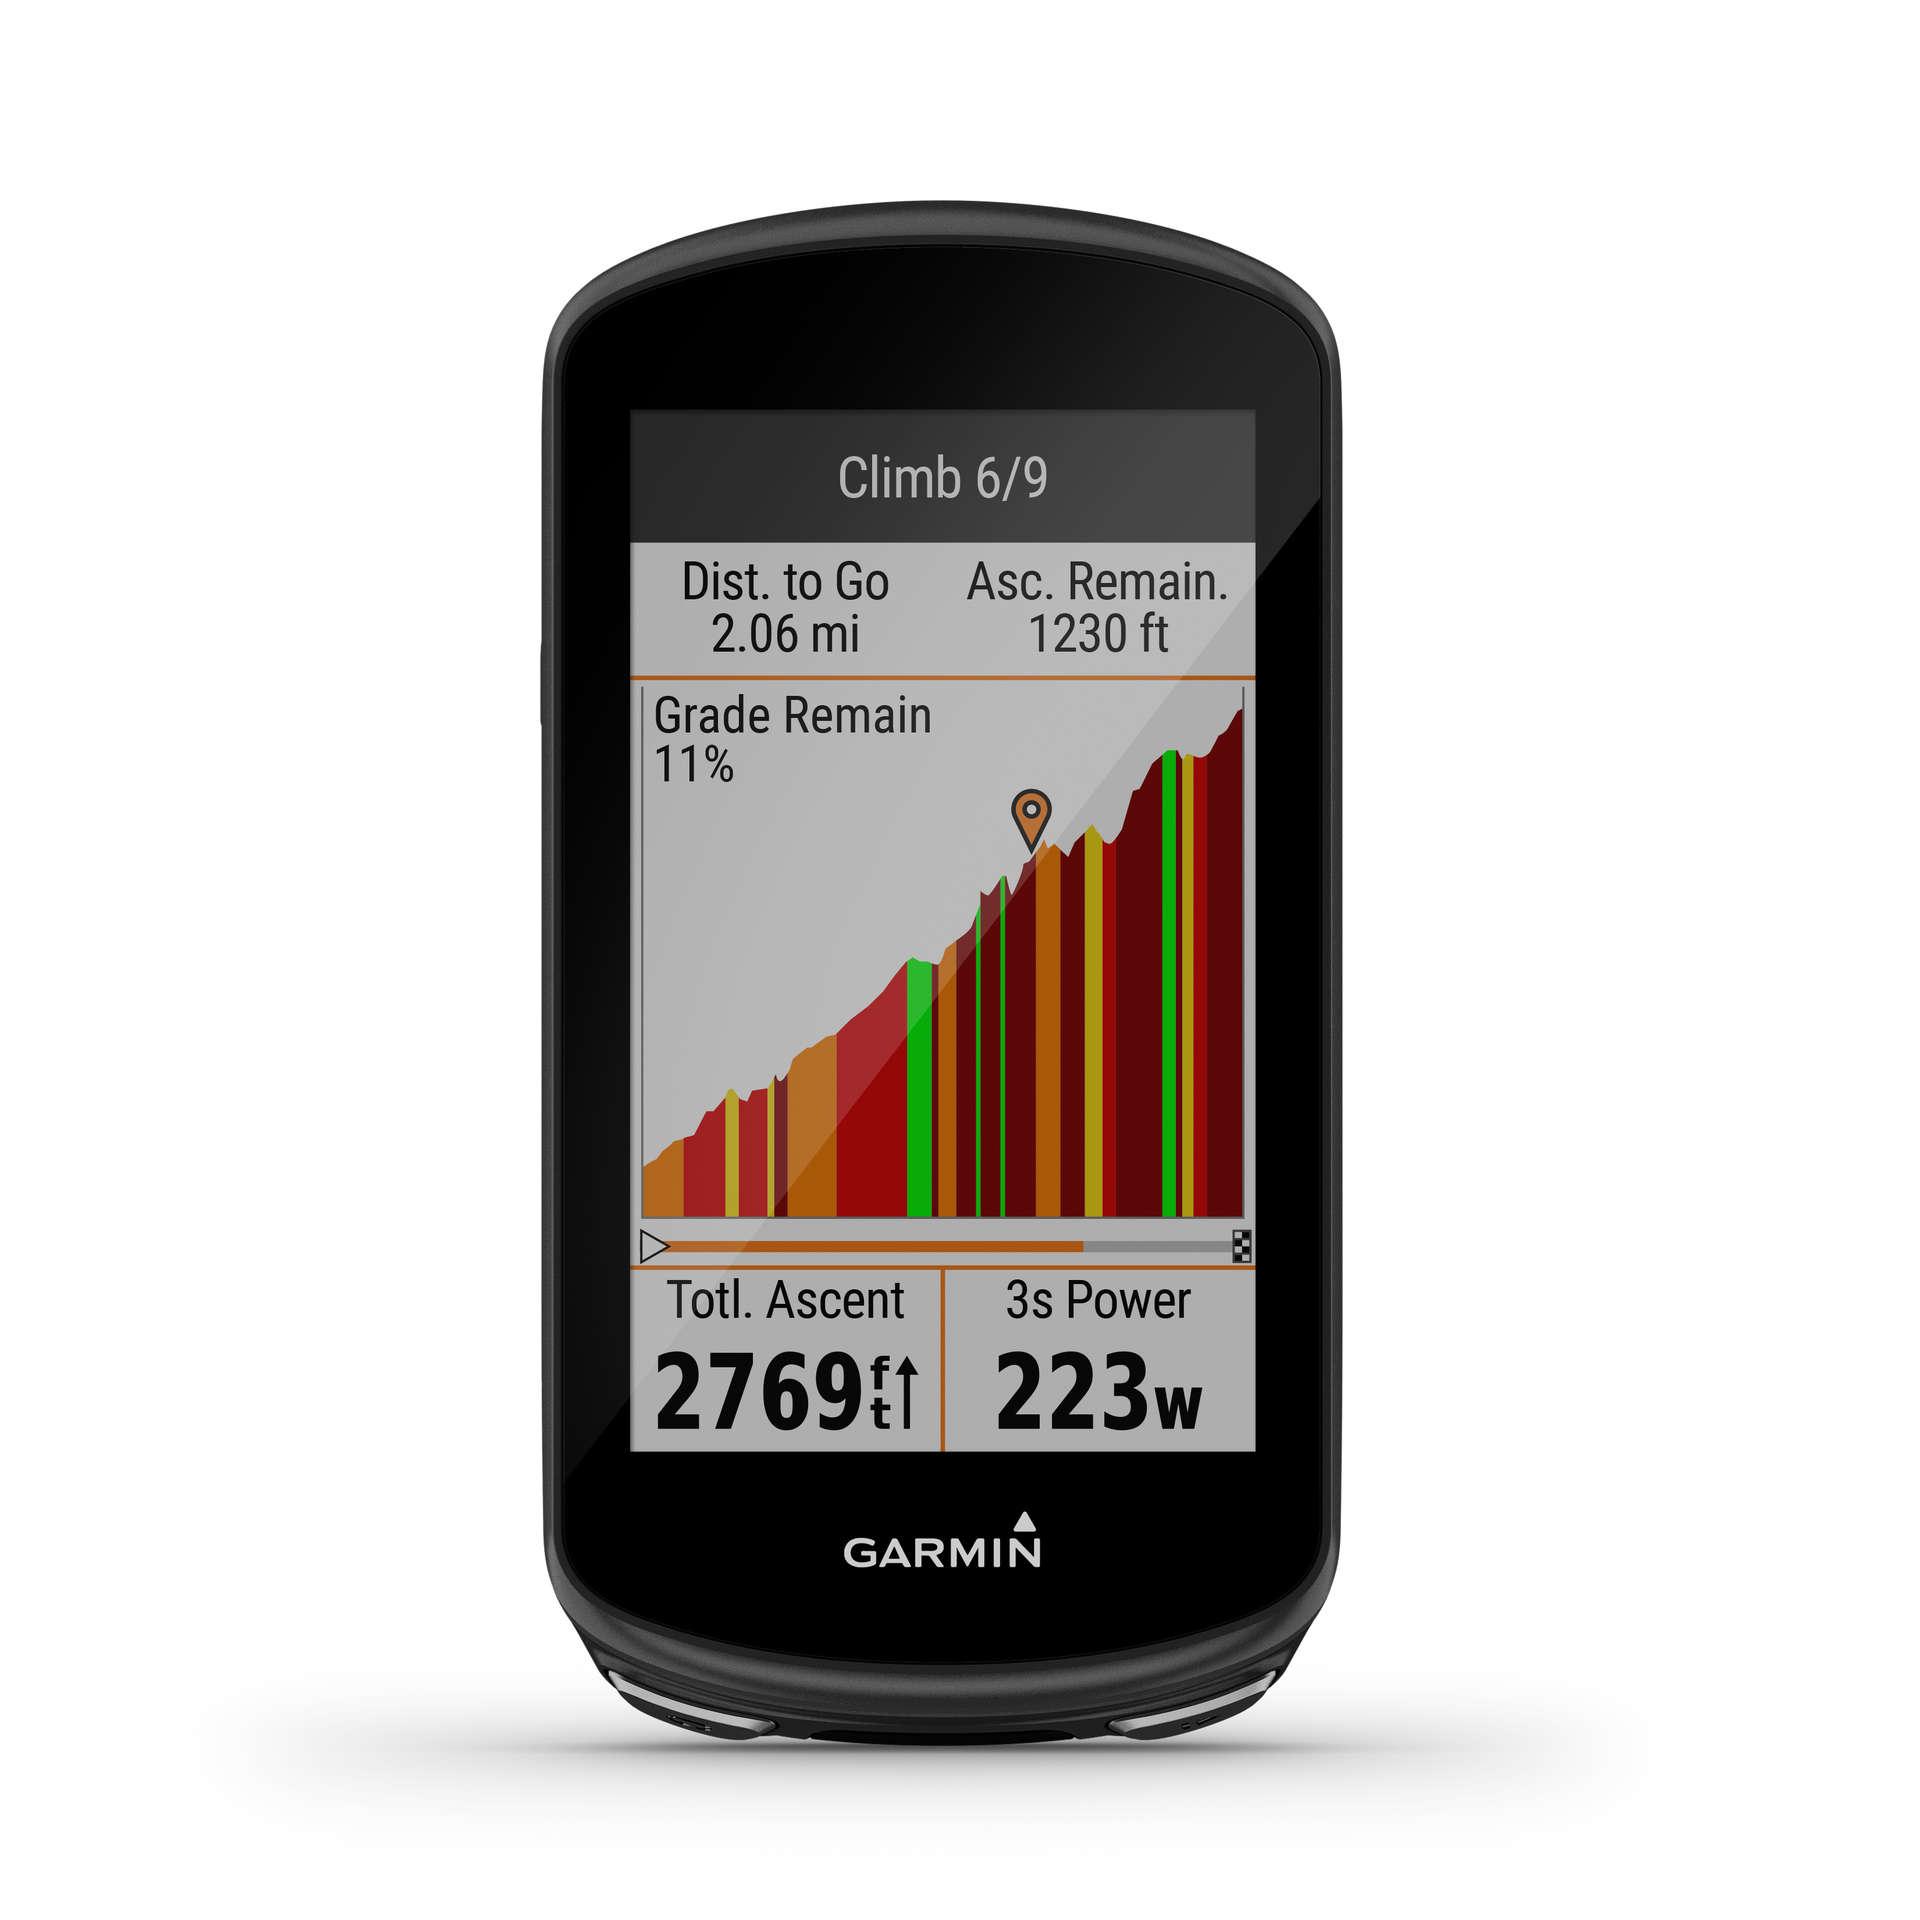 Garmin Edge 1030 Plus ClimbPro